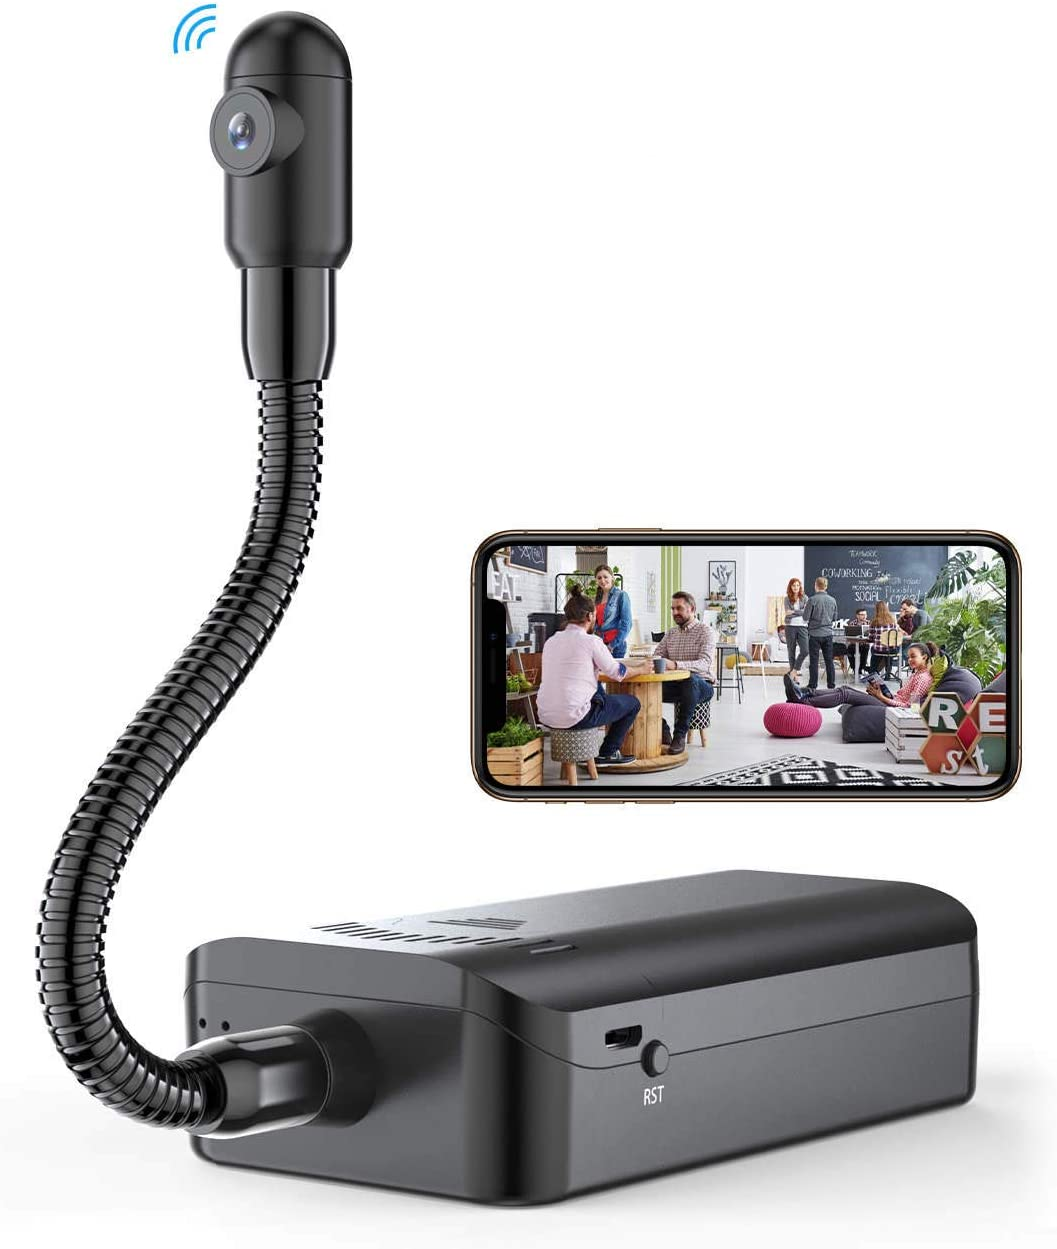 Semi-Rigid Snake Camera,Hidden Spy Camera Wireless WiFi Mini Hidden Home Security 1080P Camera for Android and iOS Smartphone